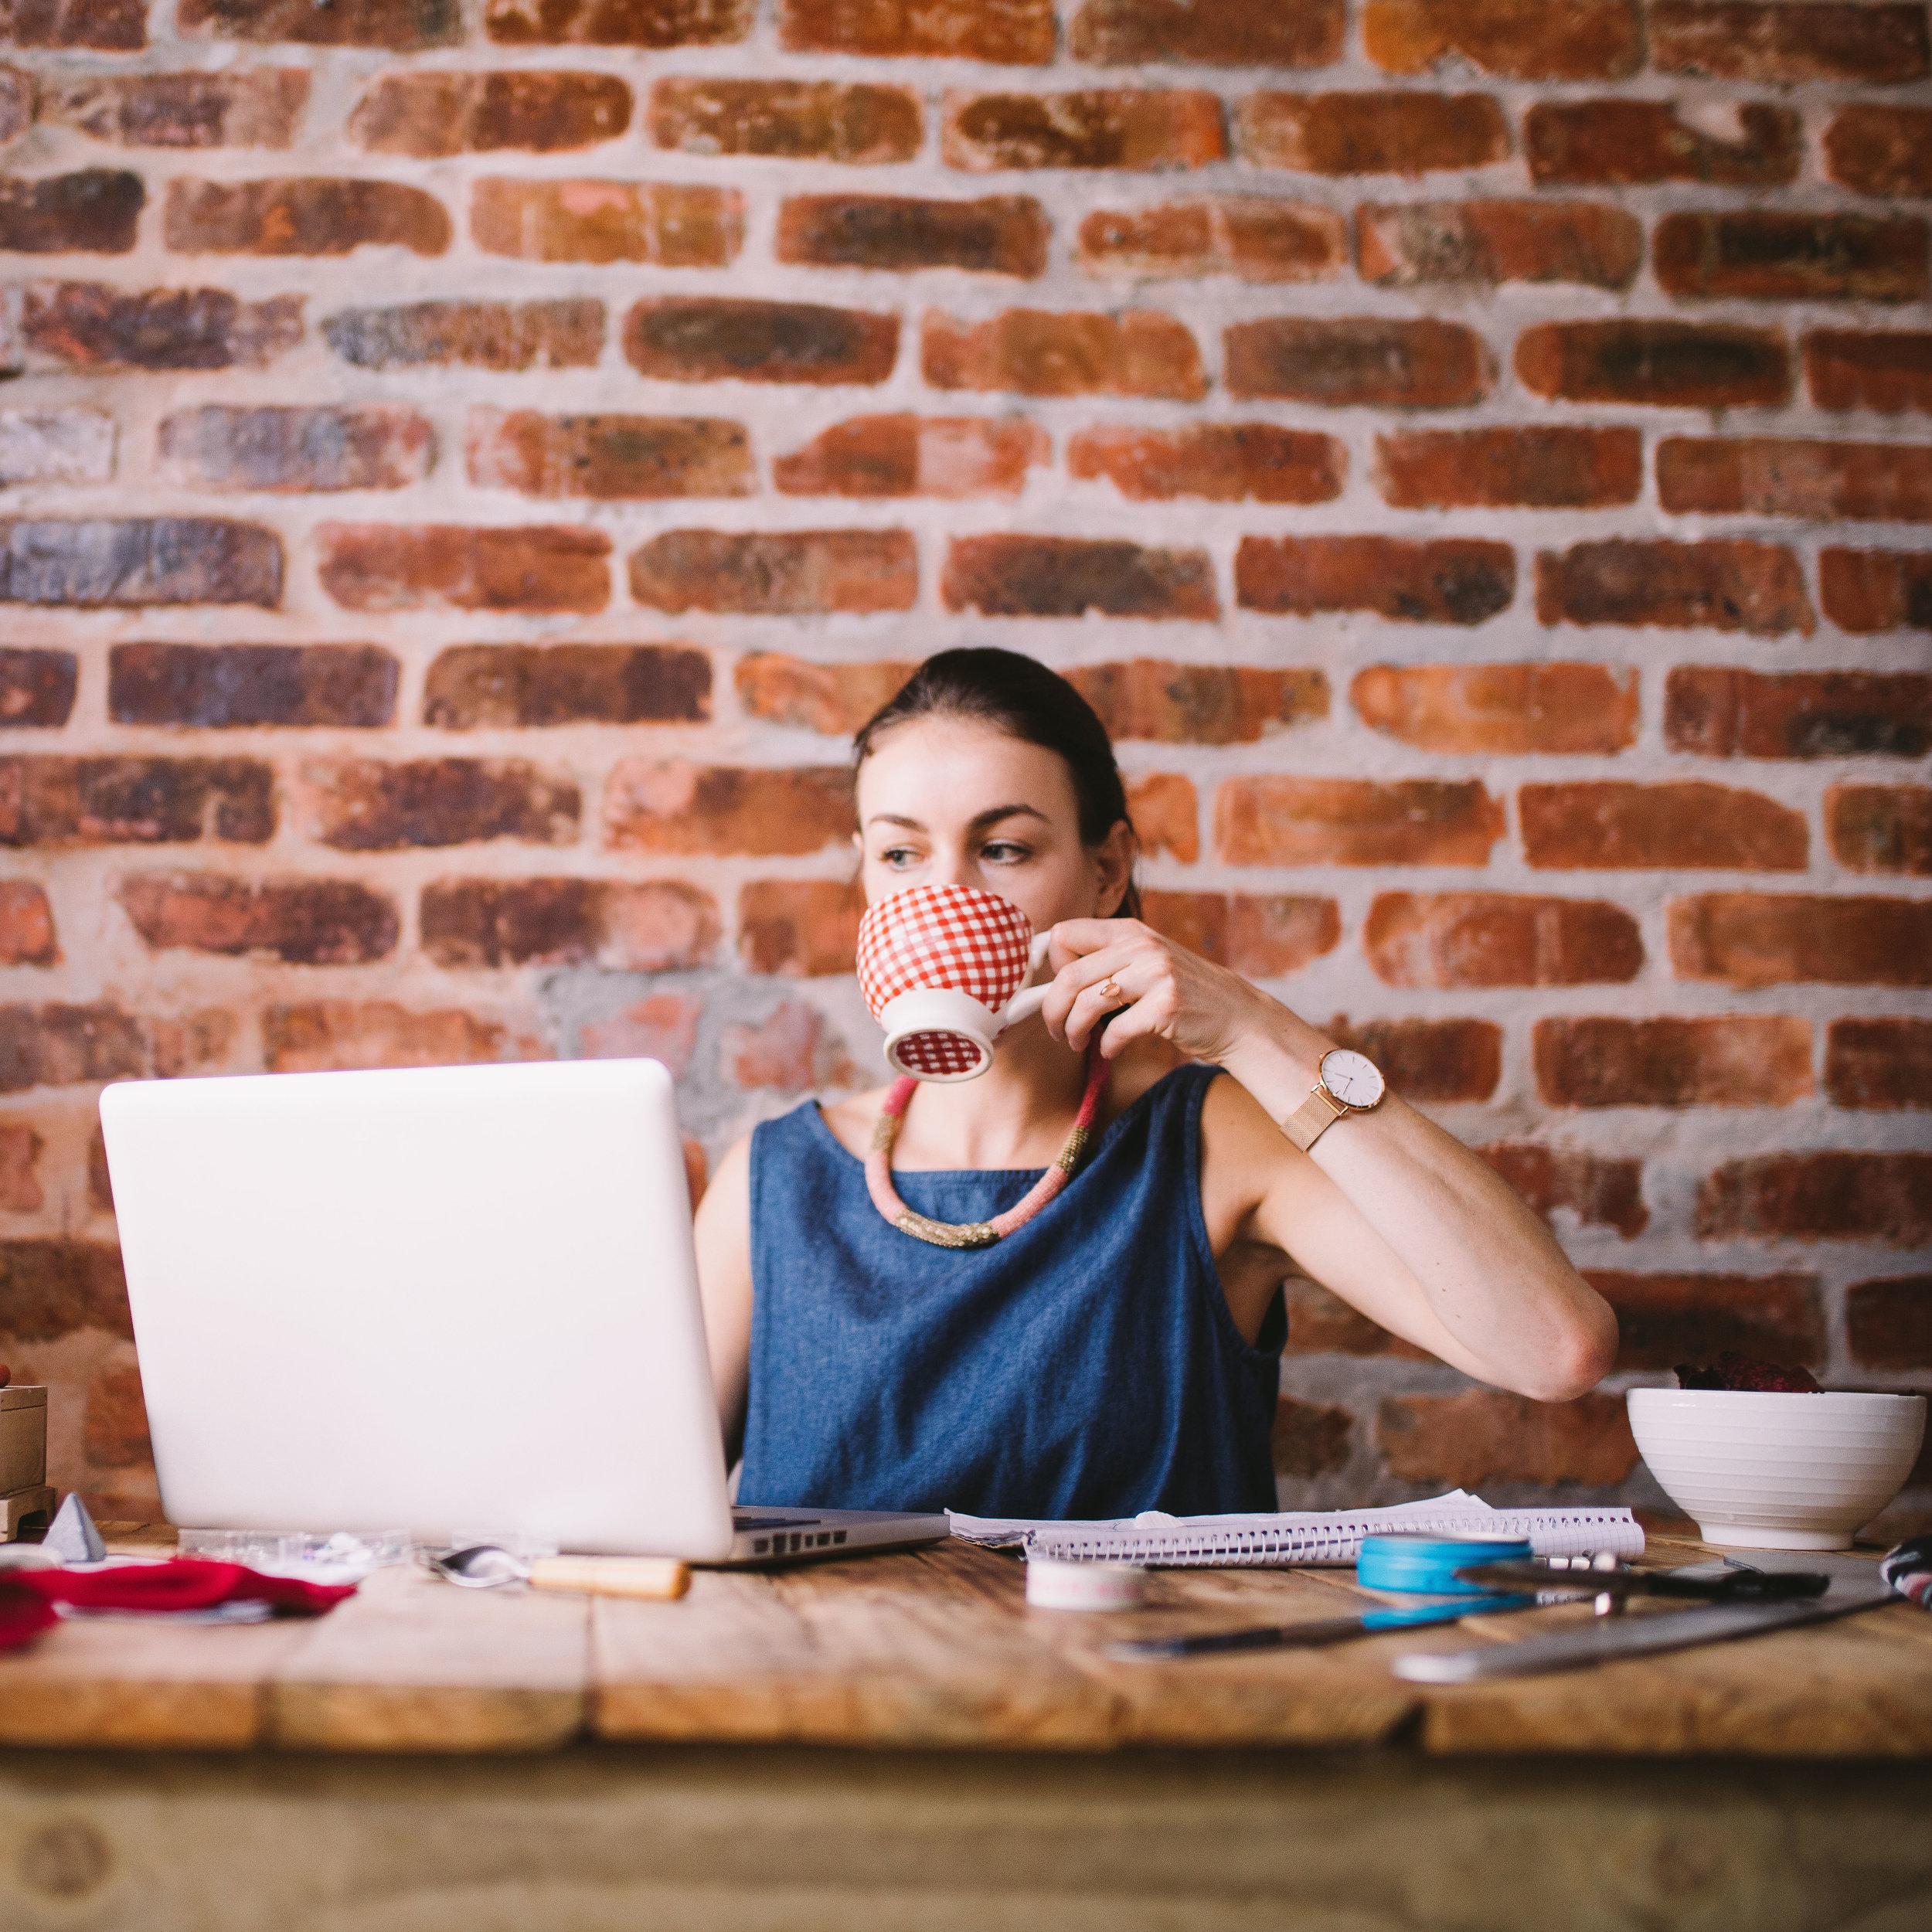 business-working-technology-coffee-office-businesswoman-laptop-drinking-notebook-business-woman_t20_Zz0mYY.jpg